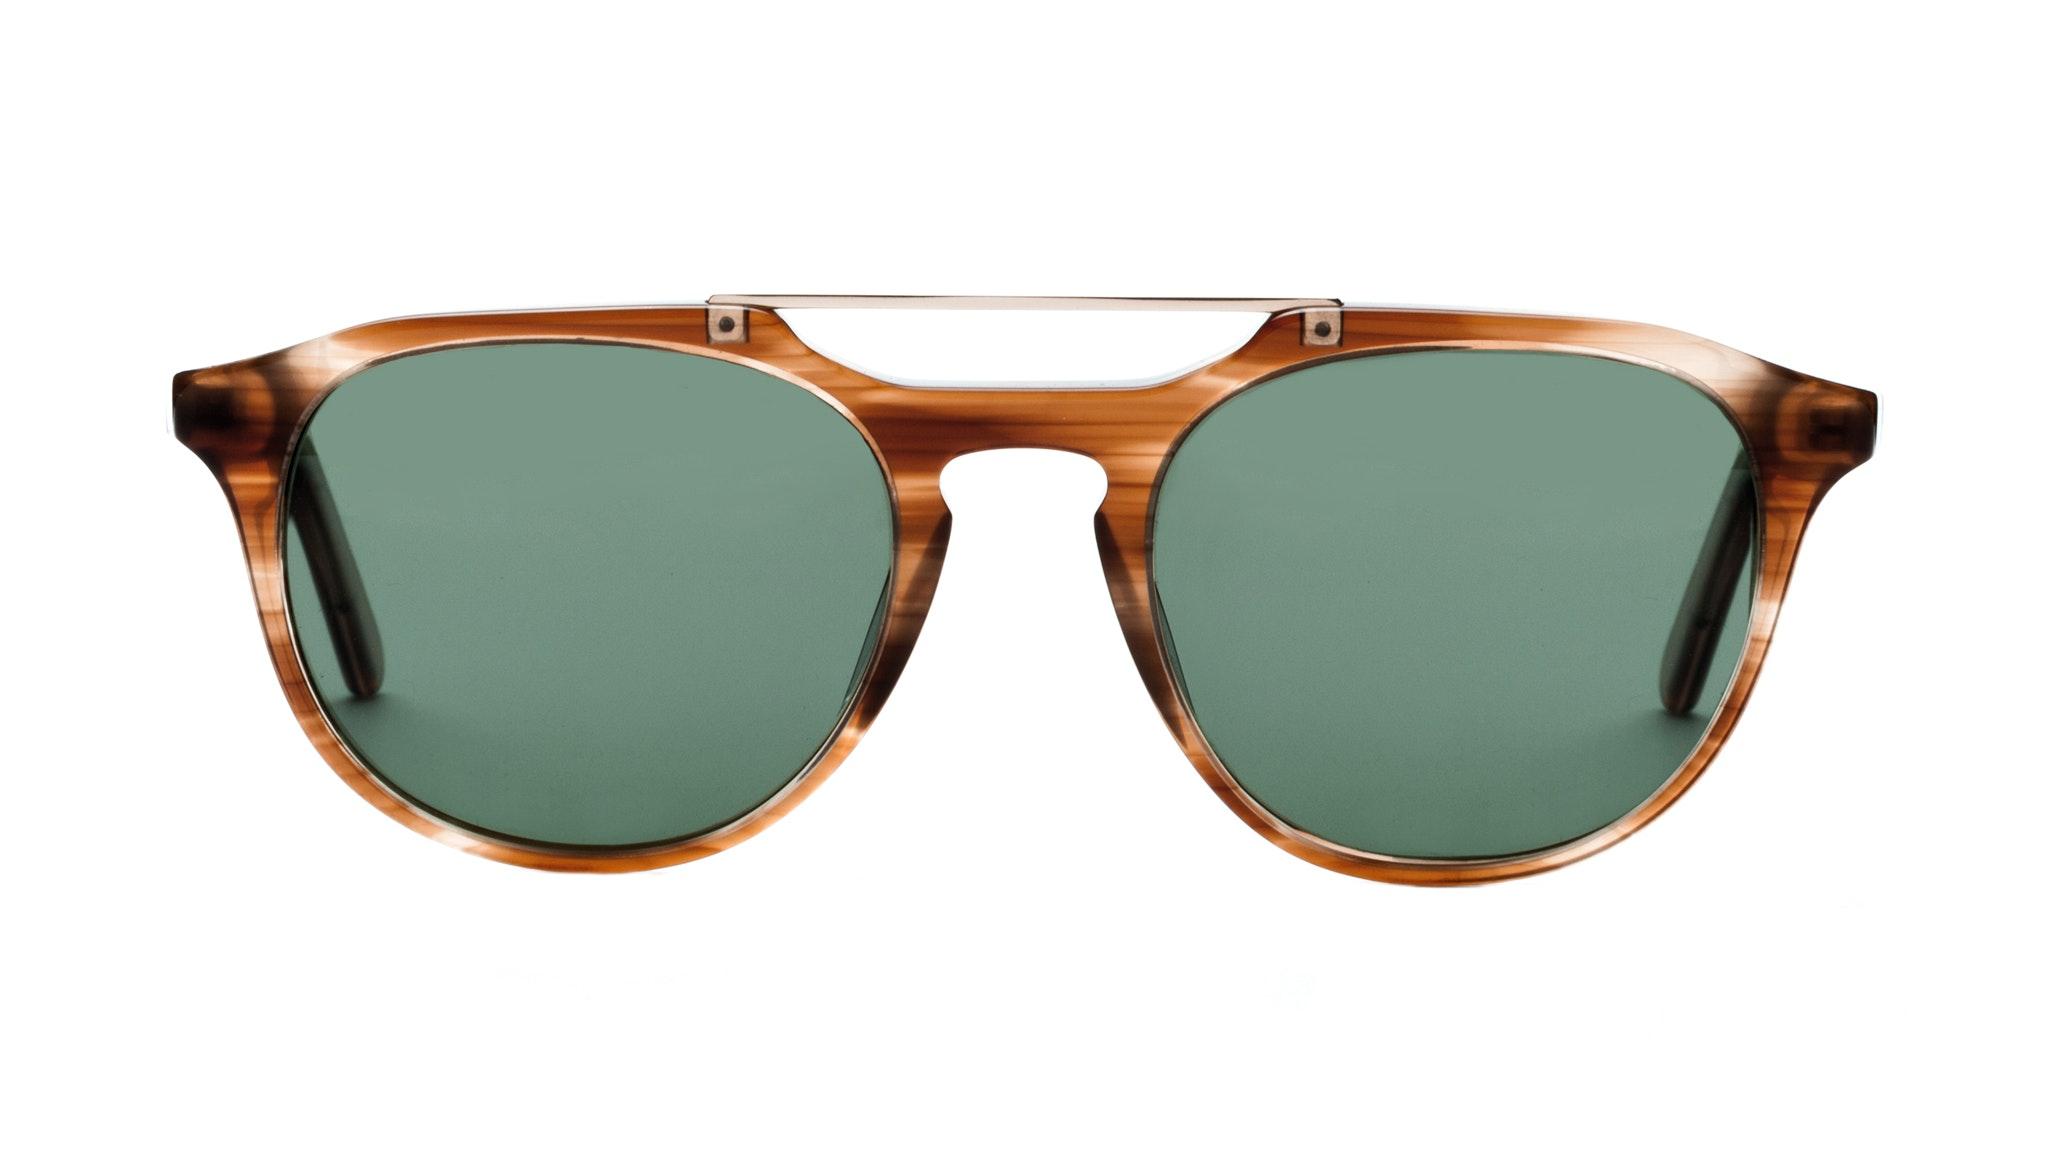 Affordable Fashion Glasses Aviator Rectangle Sunglasses Men Copenhagen Caramel